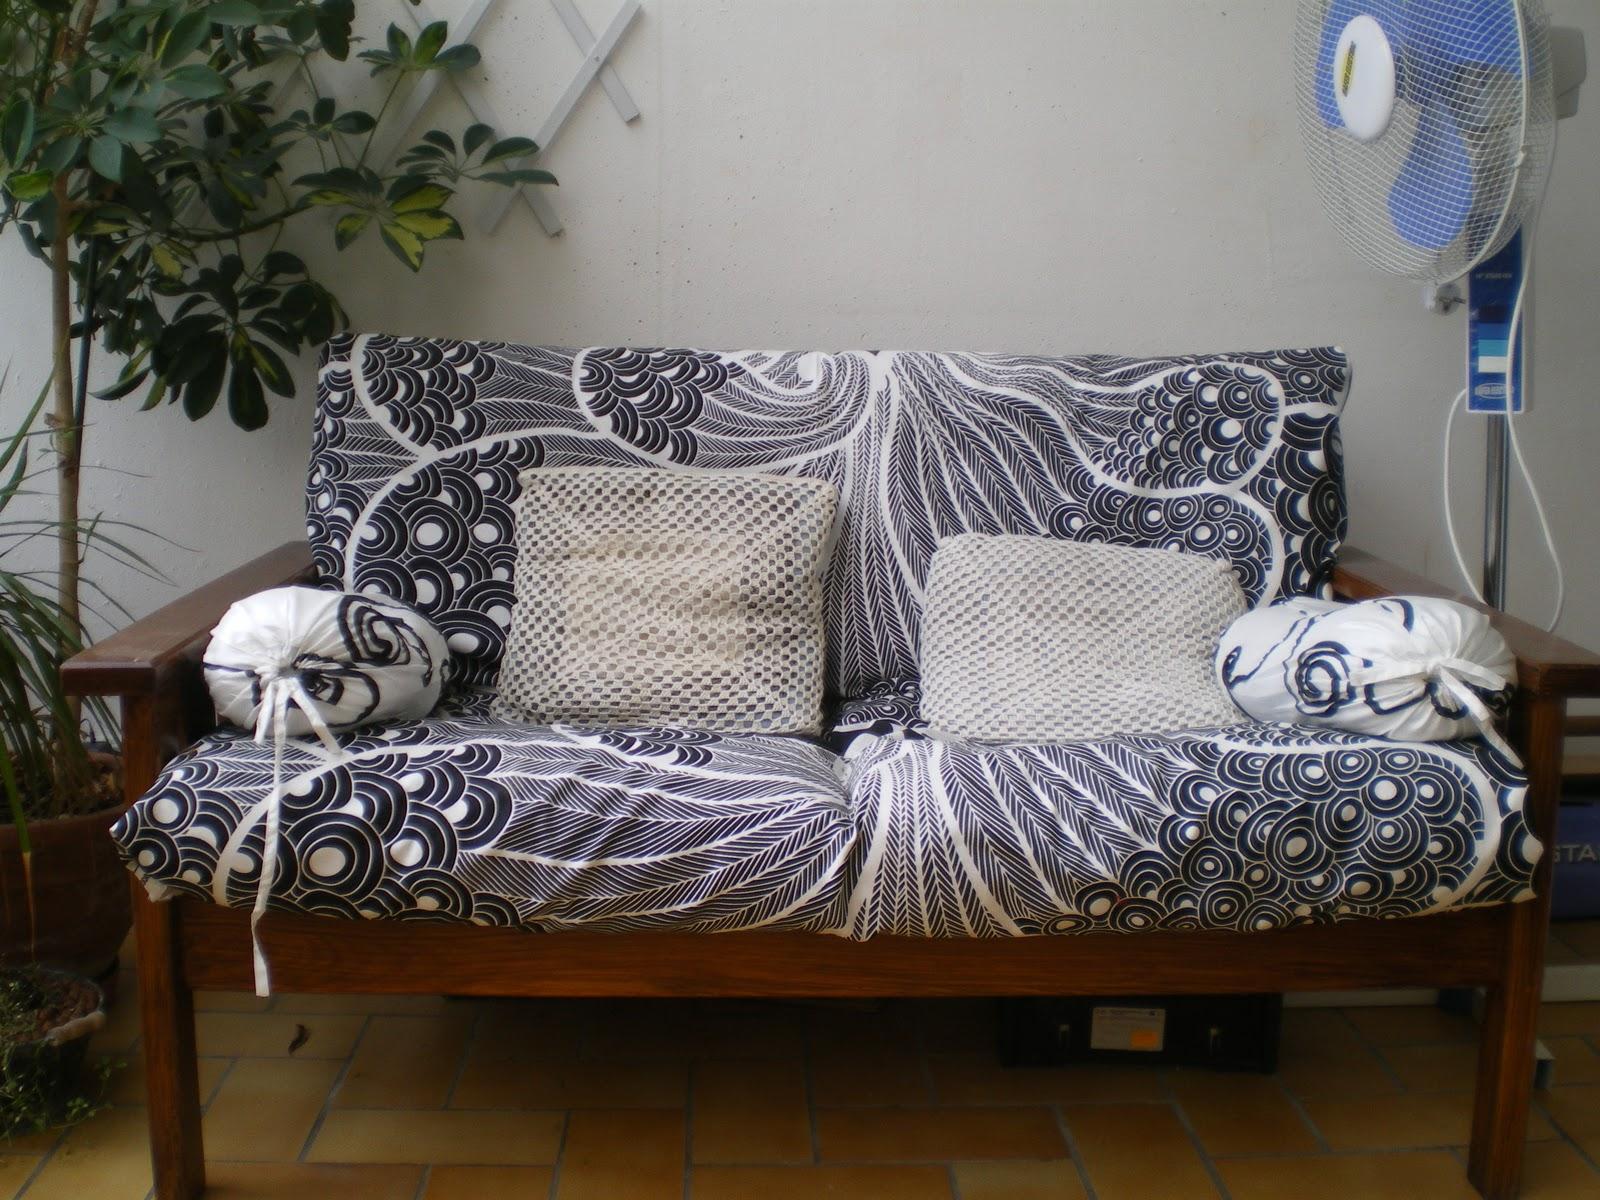 recup simple life r cup simple life ikea vintage. Black Bedroom Furniture Sets. Home Design Ideas